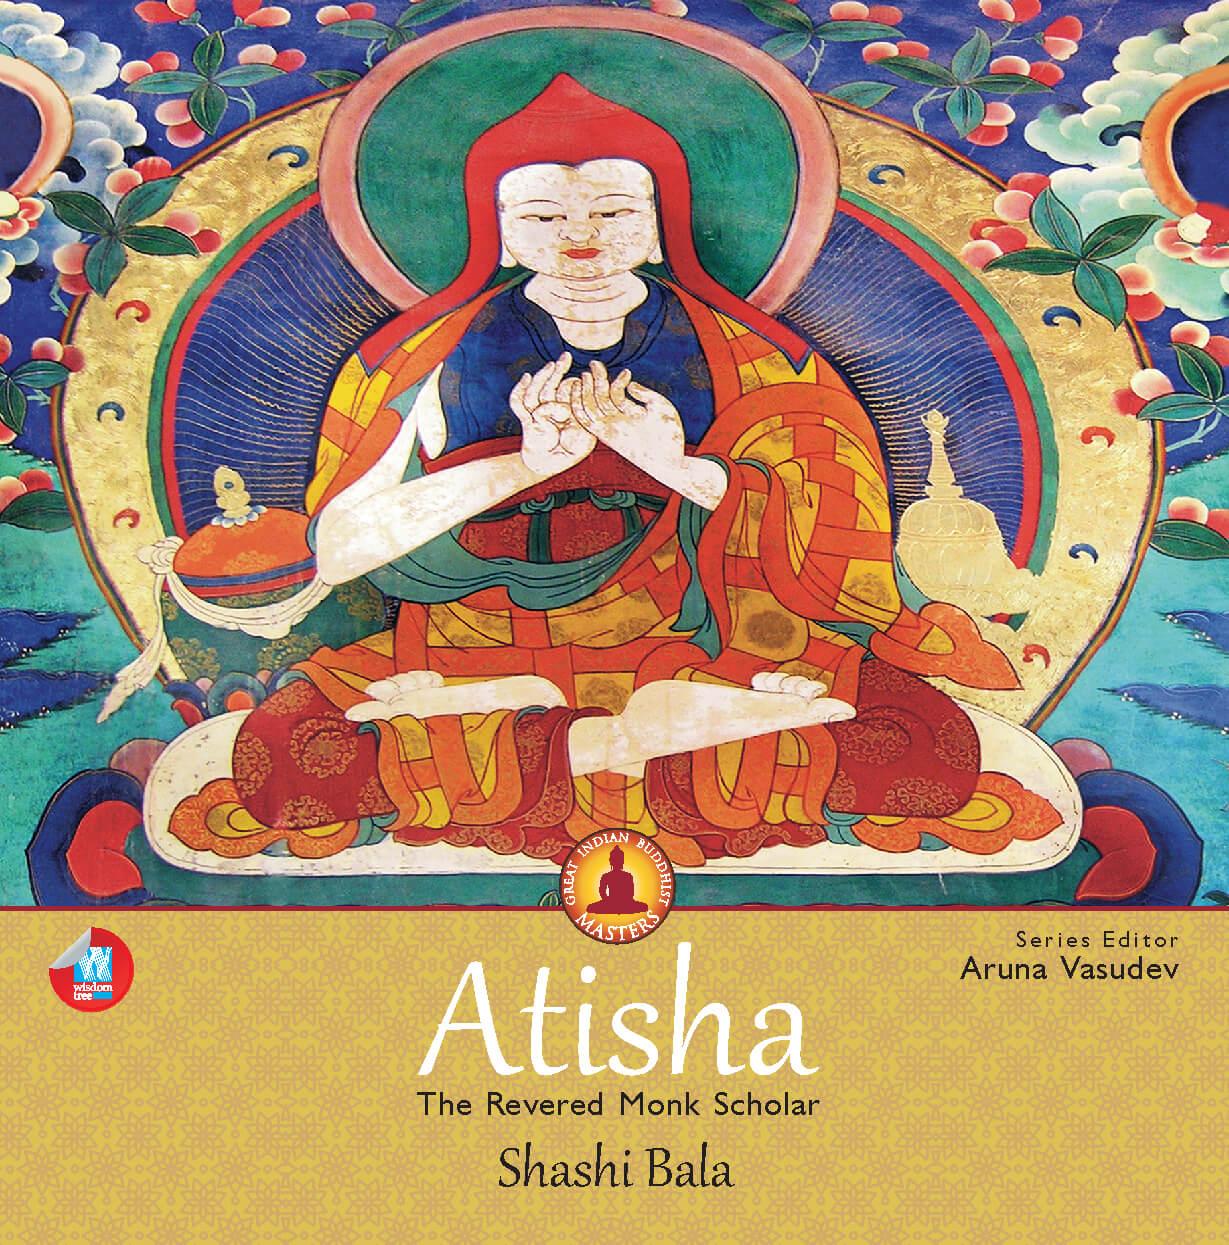 Atisha: The Revered Monk Scholar